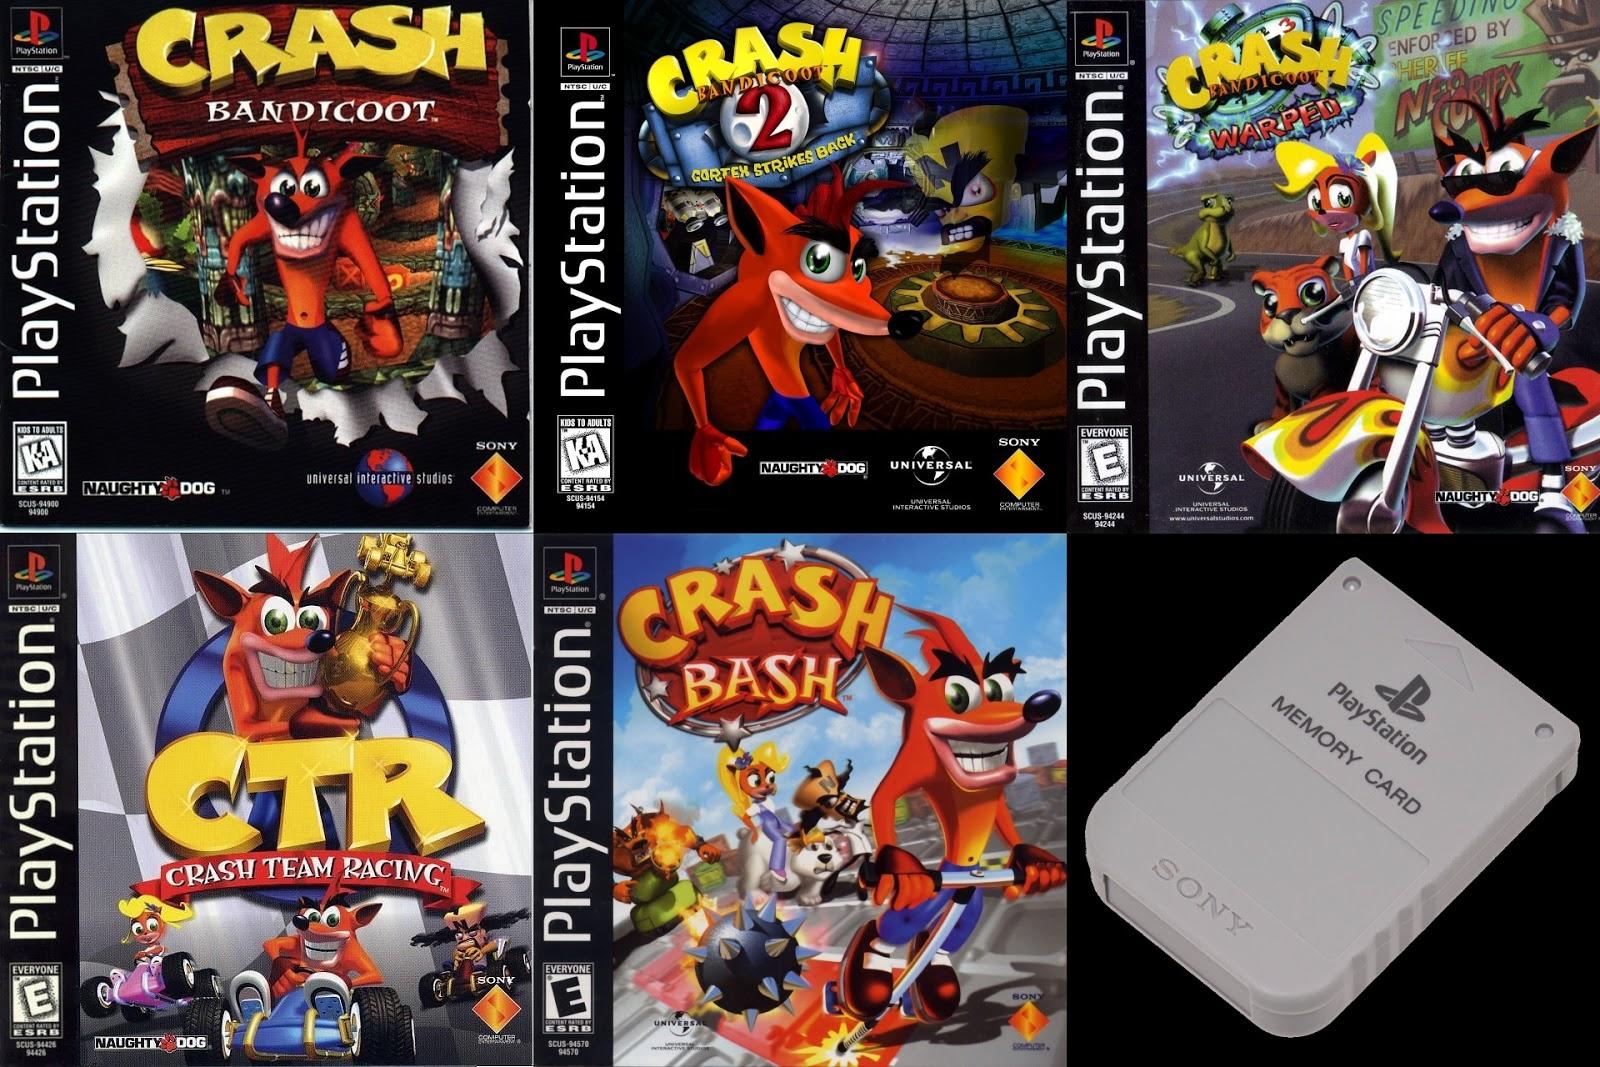 faid s blog crash bandicoot psx 100 save game